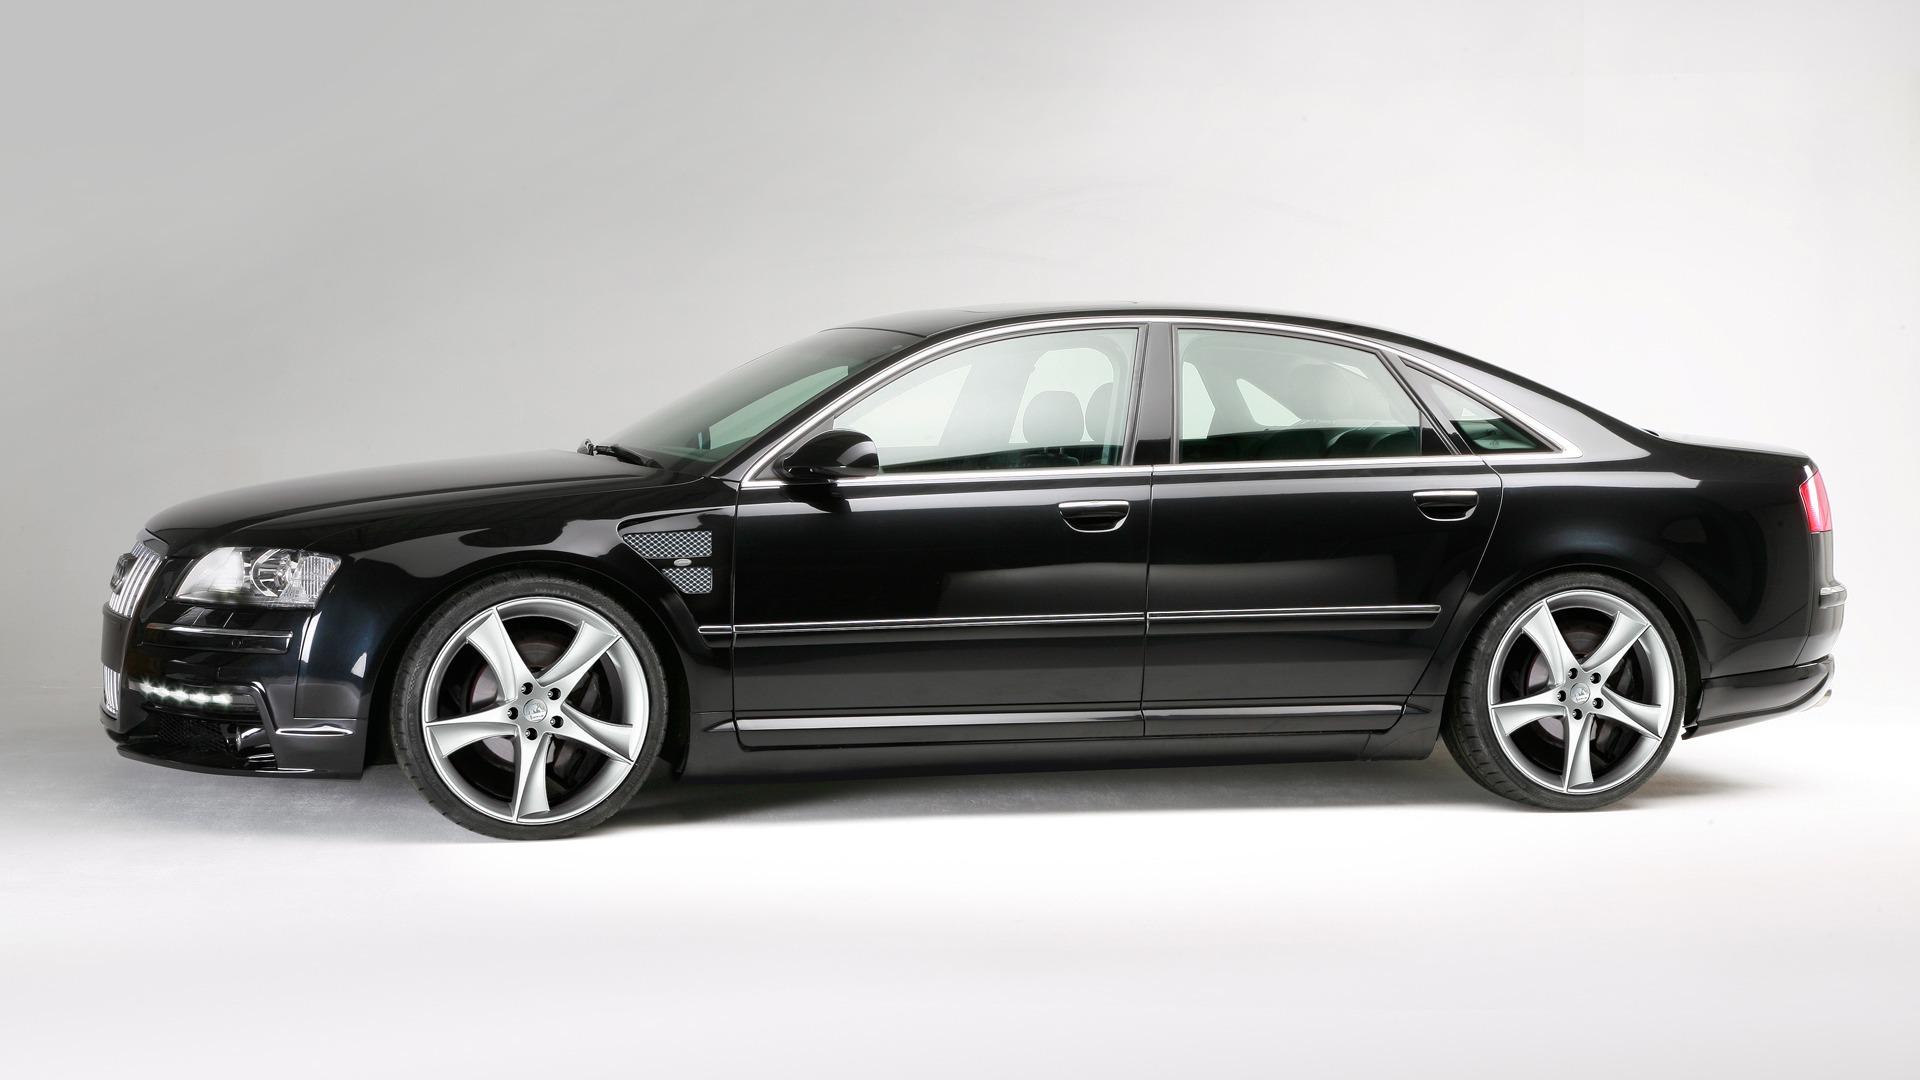 Hofele Audi A8 D3 Facelift Fondos De Escritorio De Alta